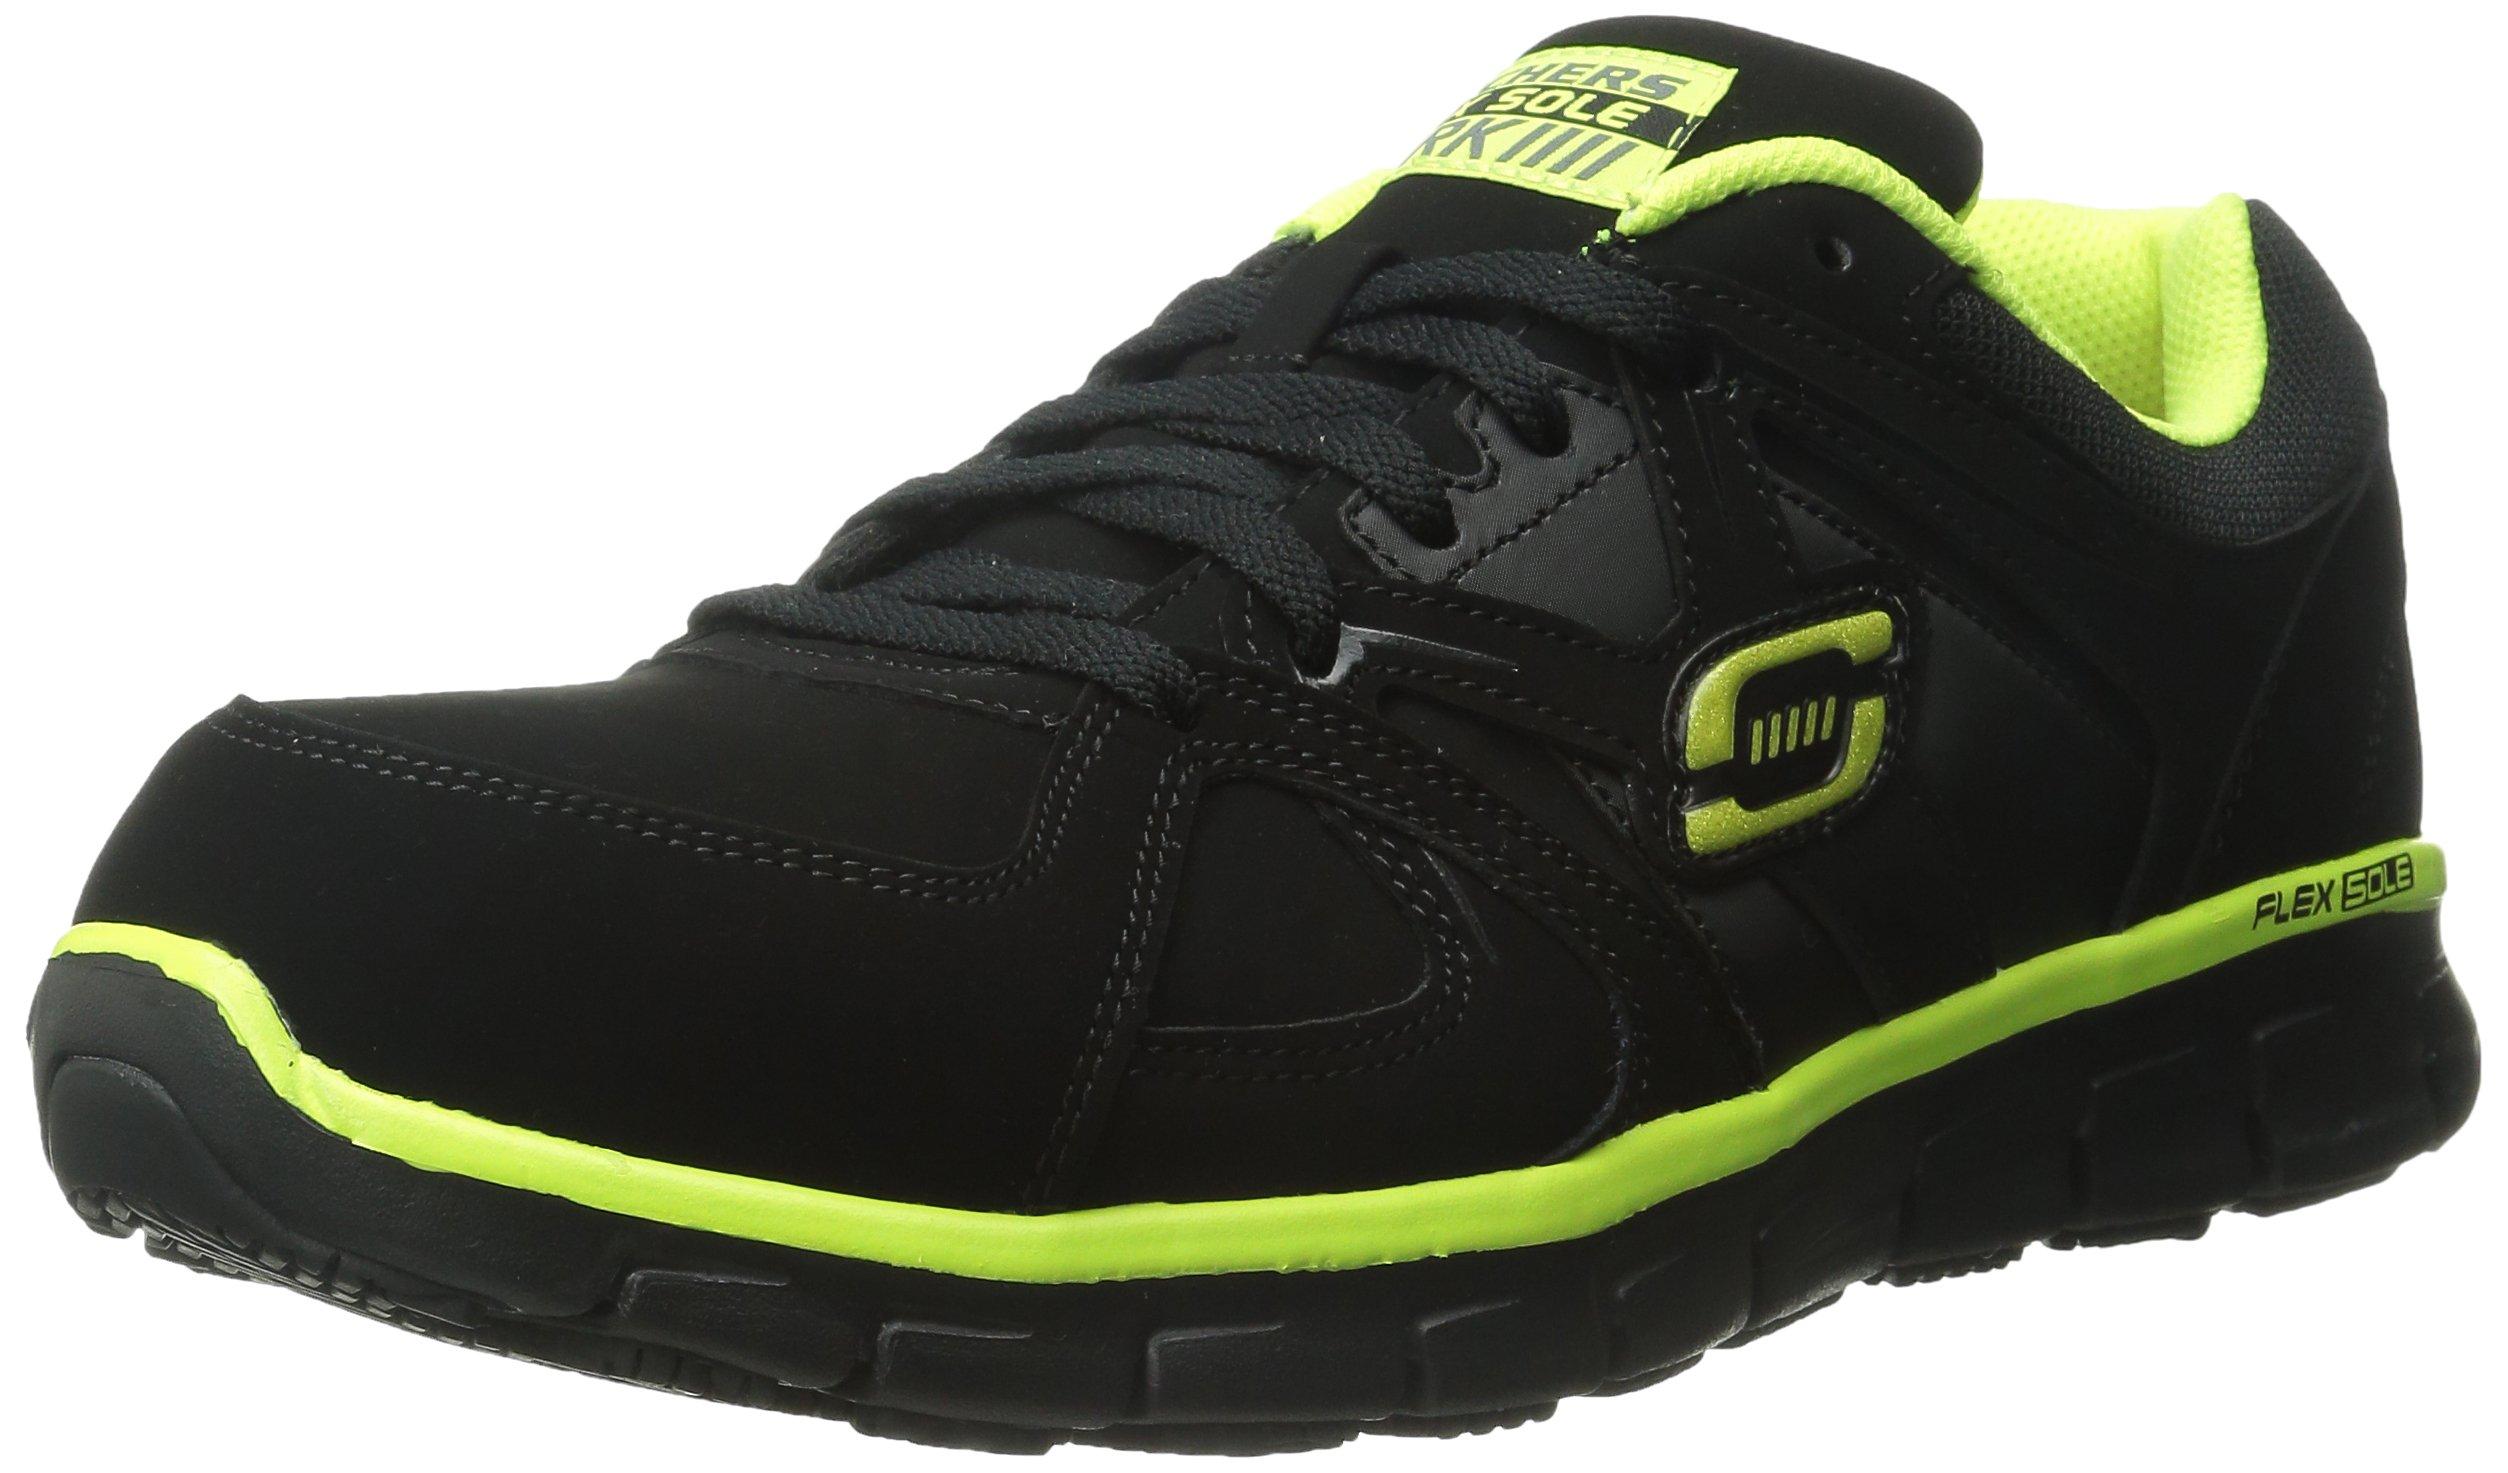 Skechers for Work Men's Synergy Ekron Walking Shoe,Black/Lime,11 M US